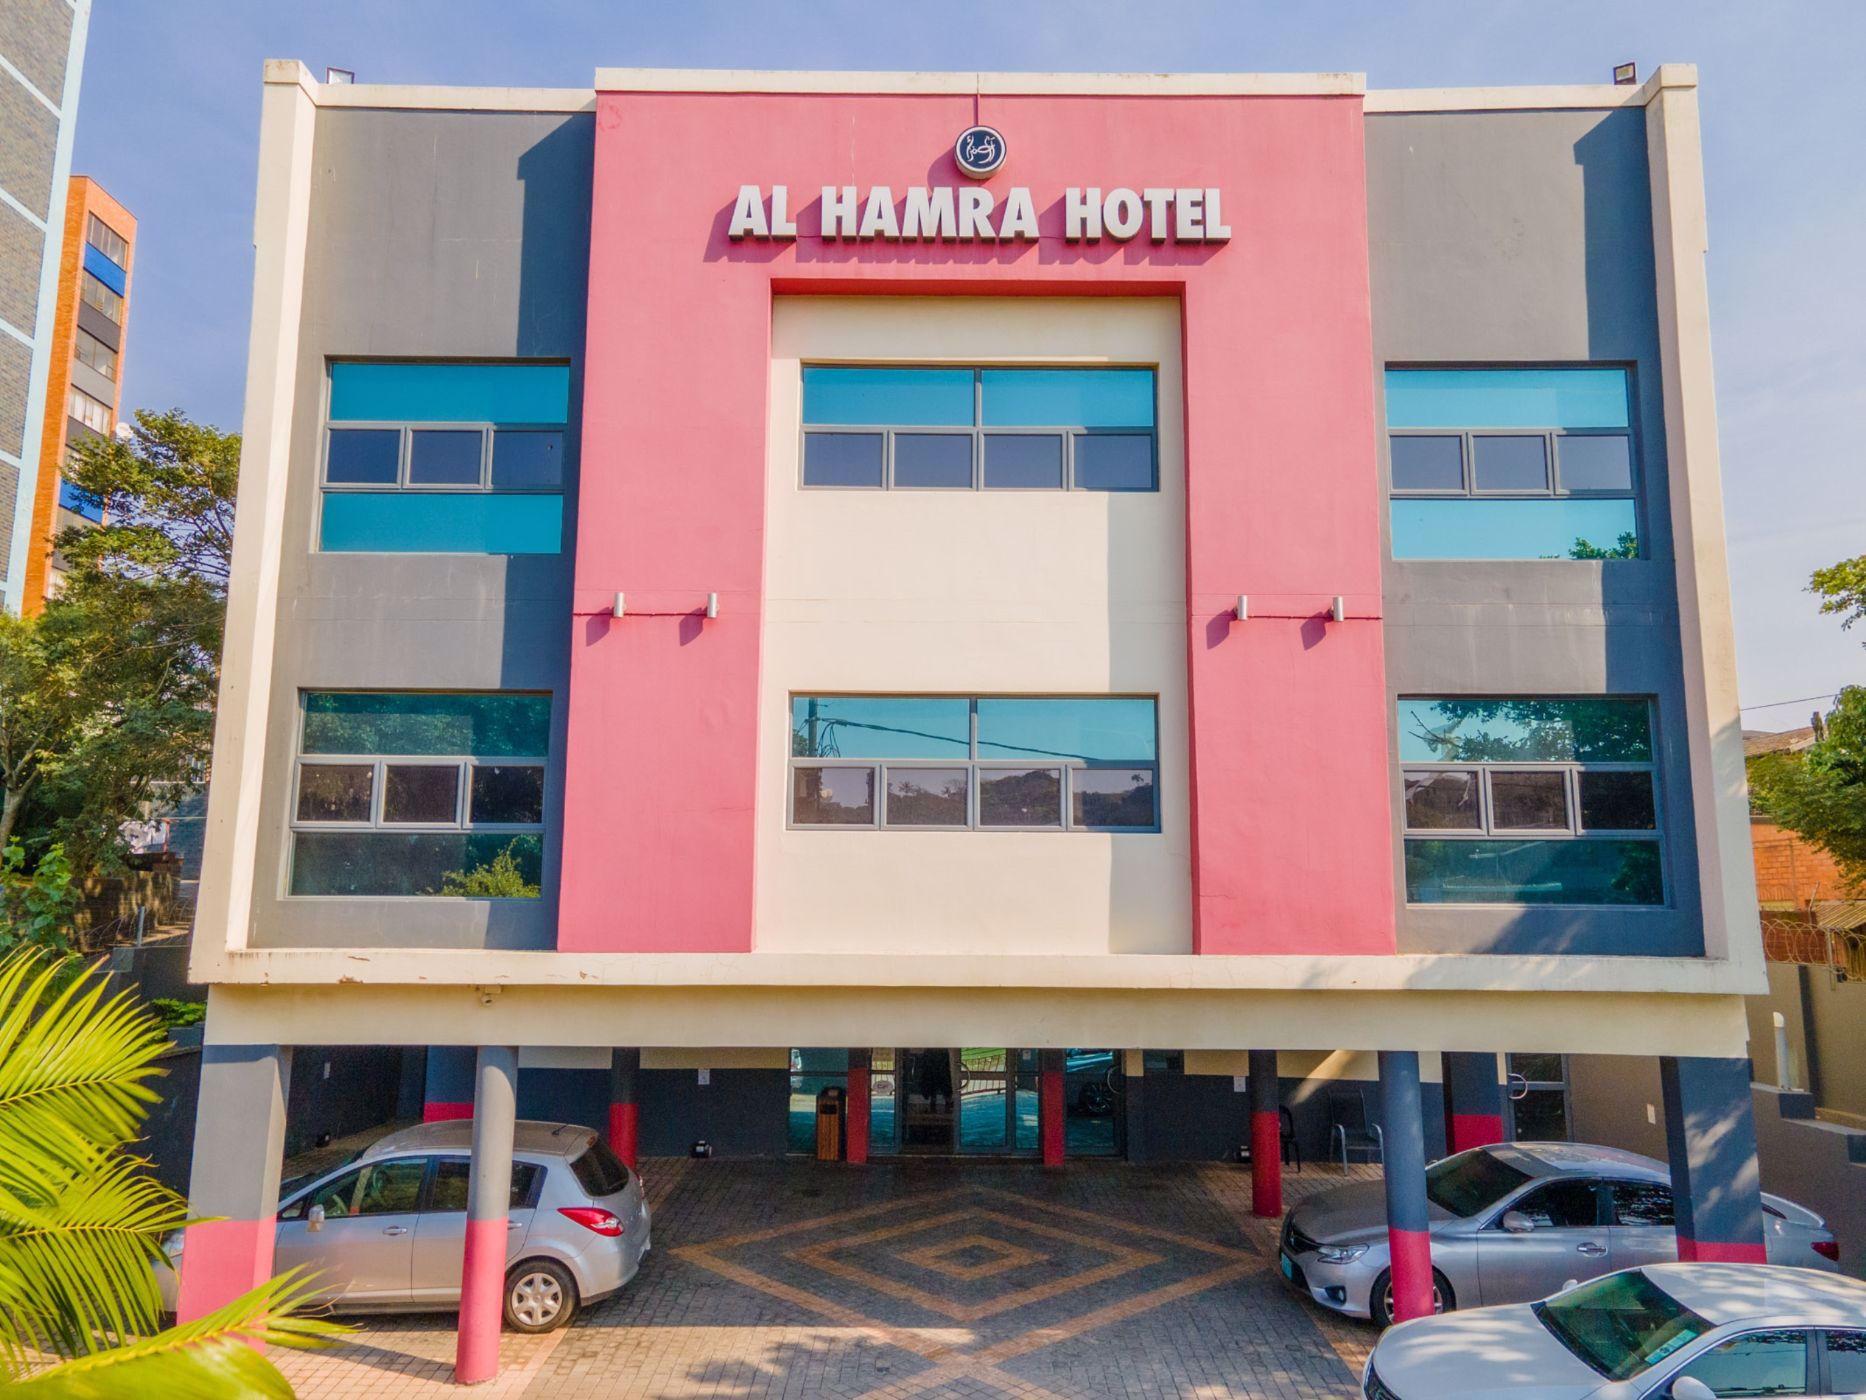 16 guest room city hotel for sale in Sydenham (Westville)